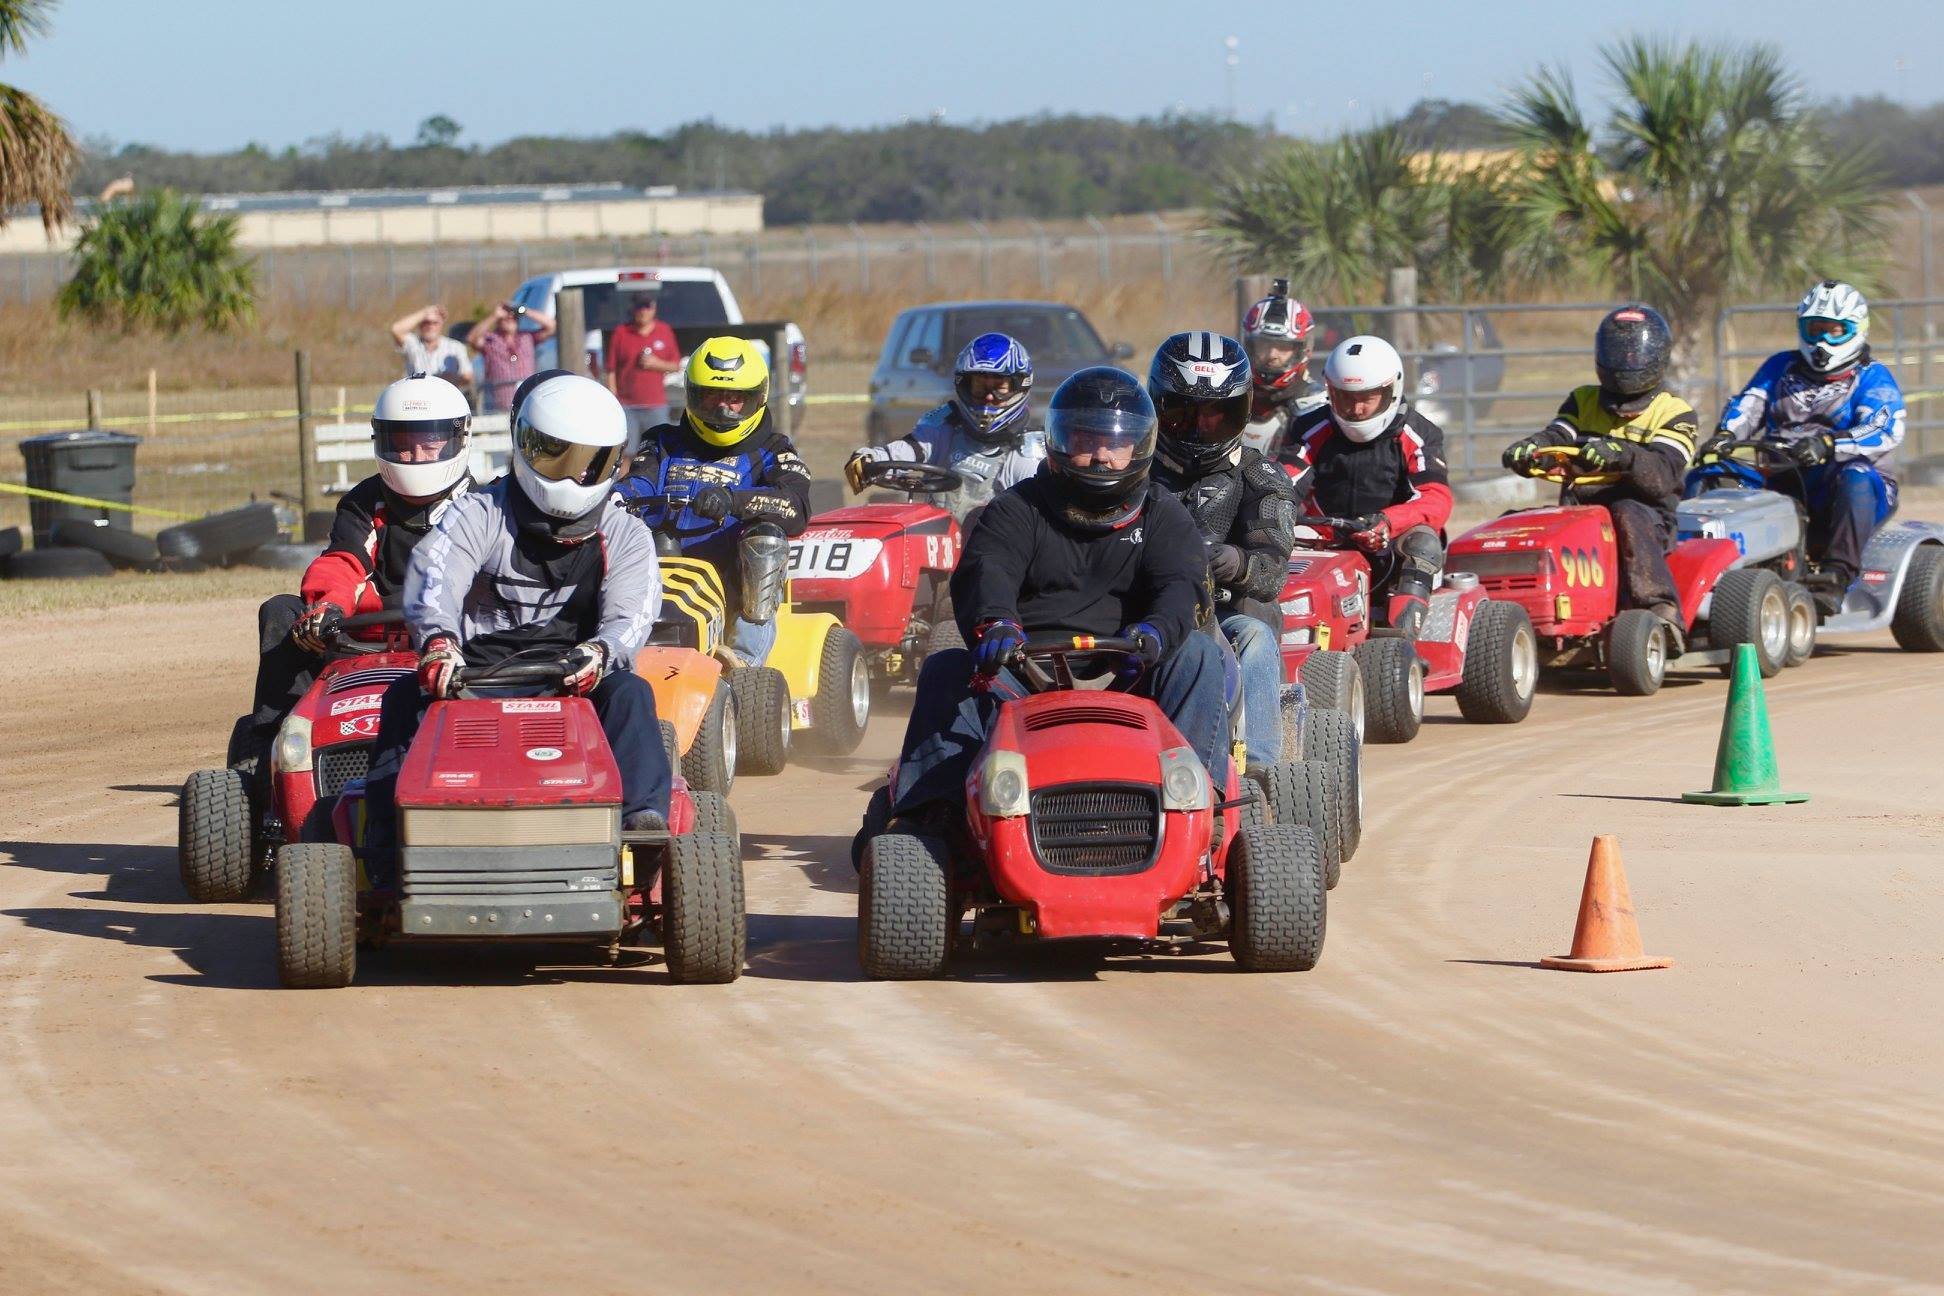 Lawn Mower Racing >> Lawn Mower Racing Season Set To Begin In Avon Park Florida